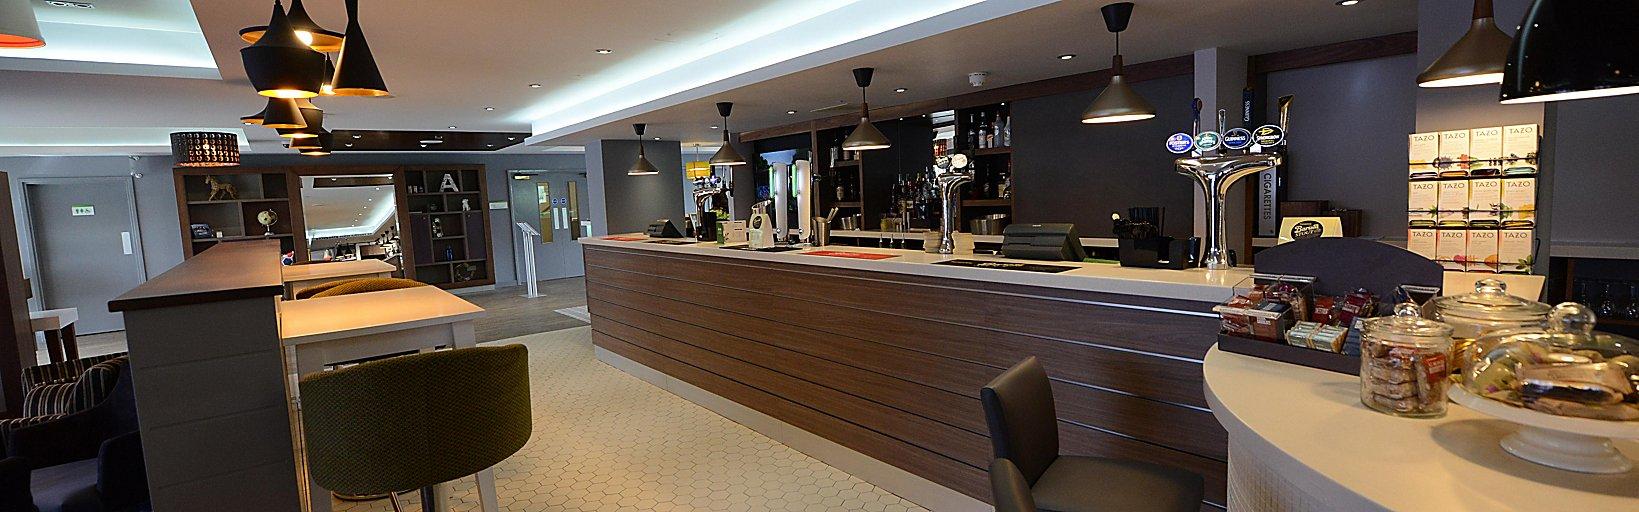 Holiday Inn Wolverhampton Hotels Holiday Inn Wolverhampton